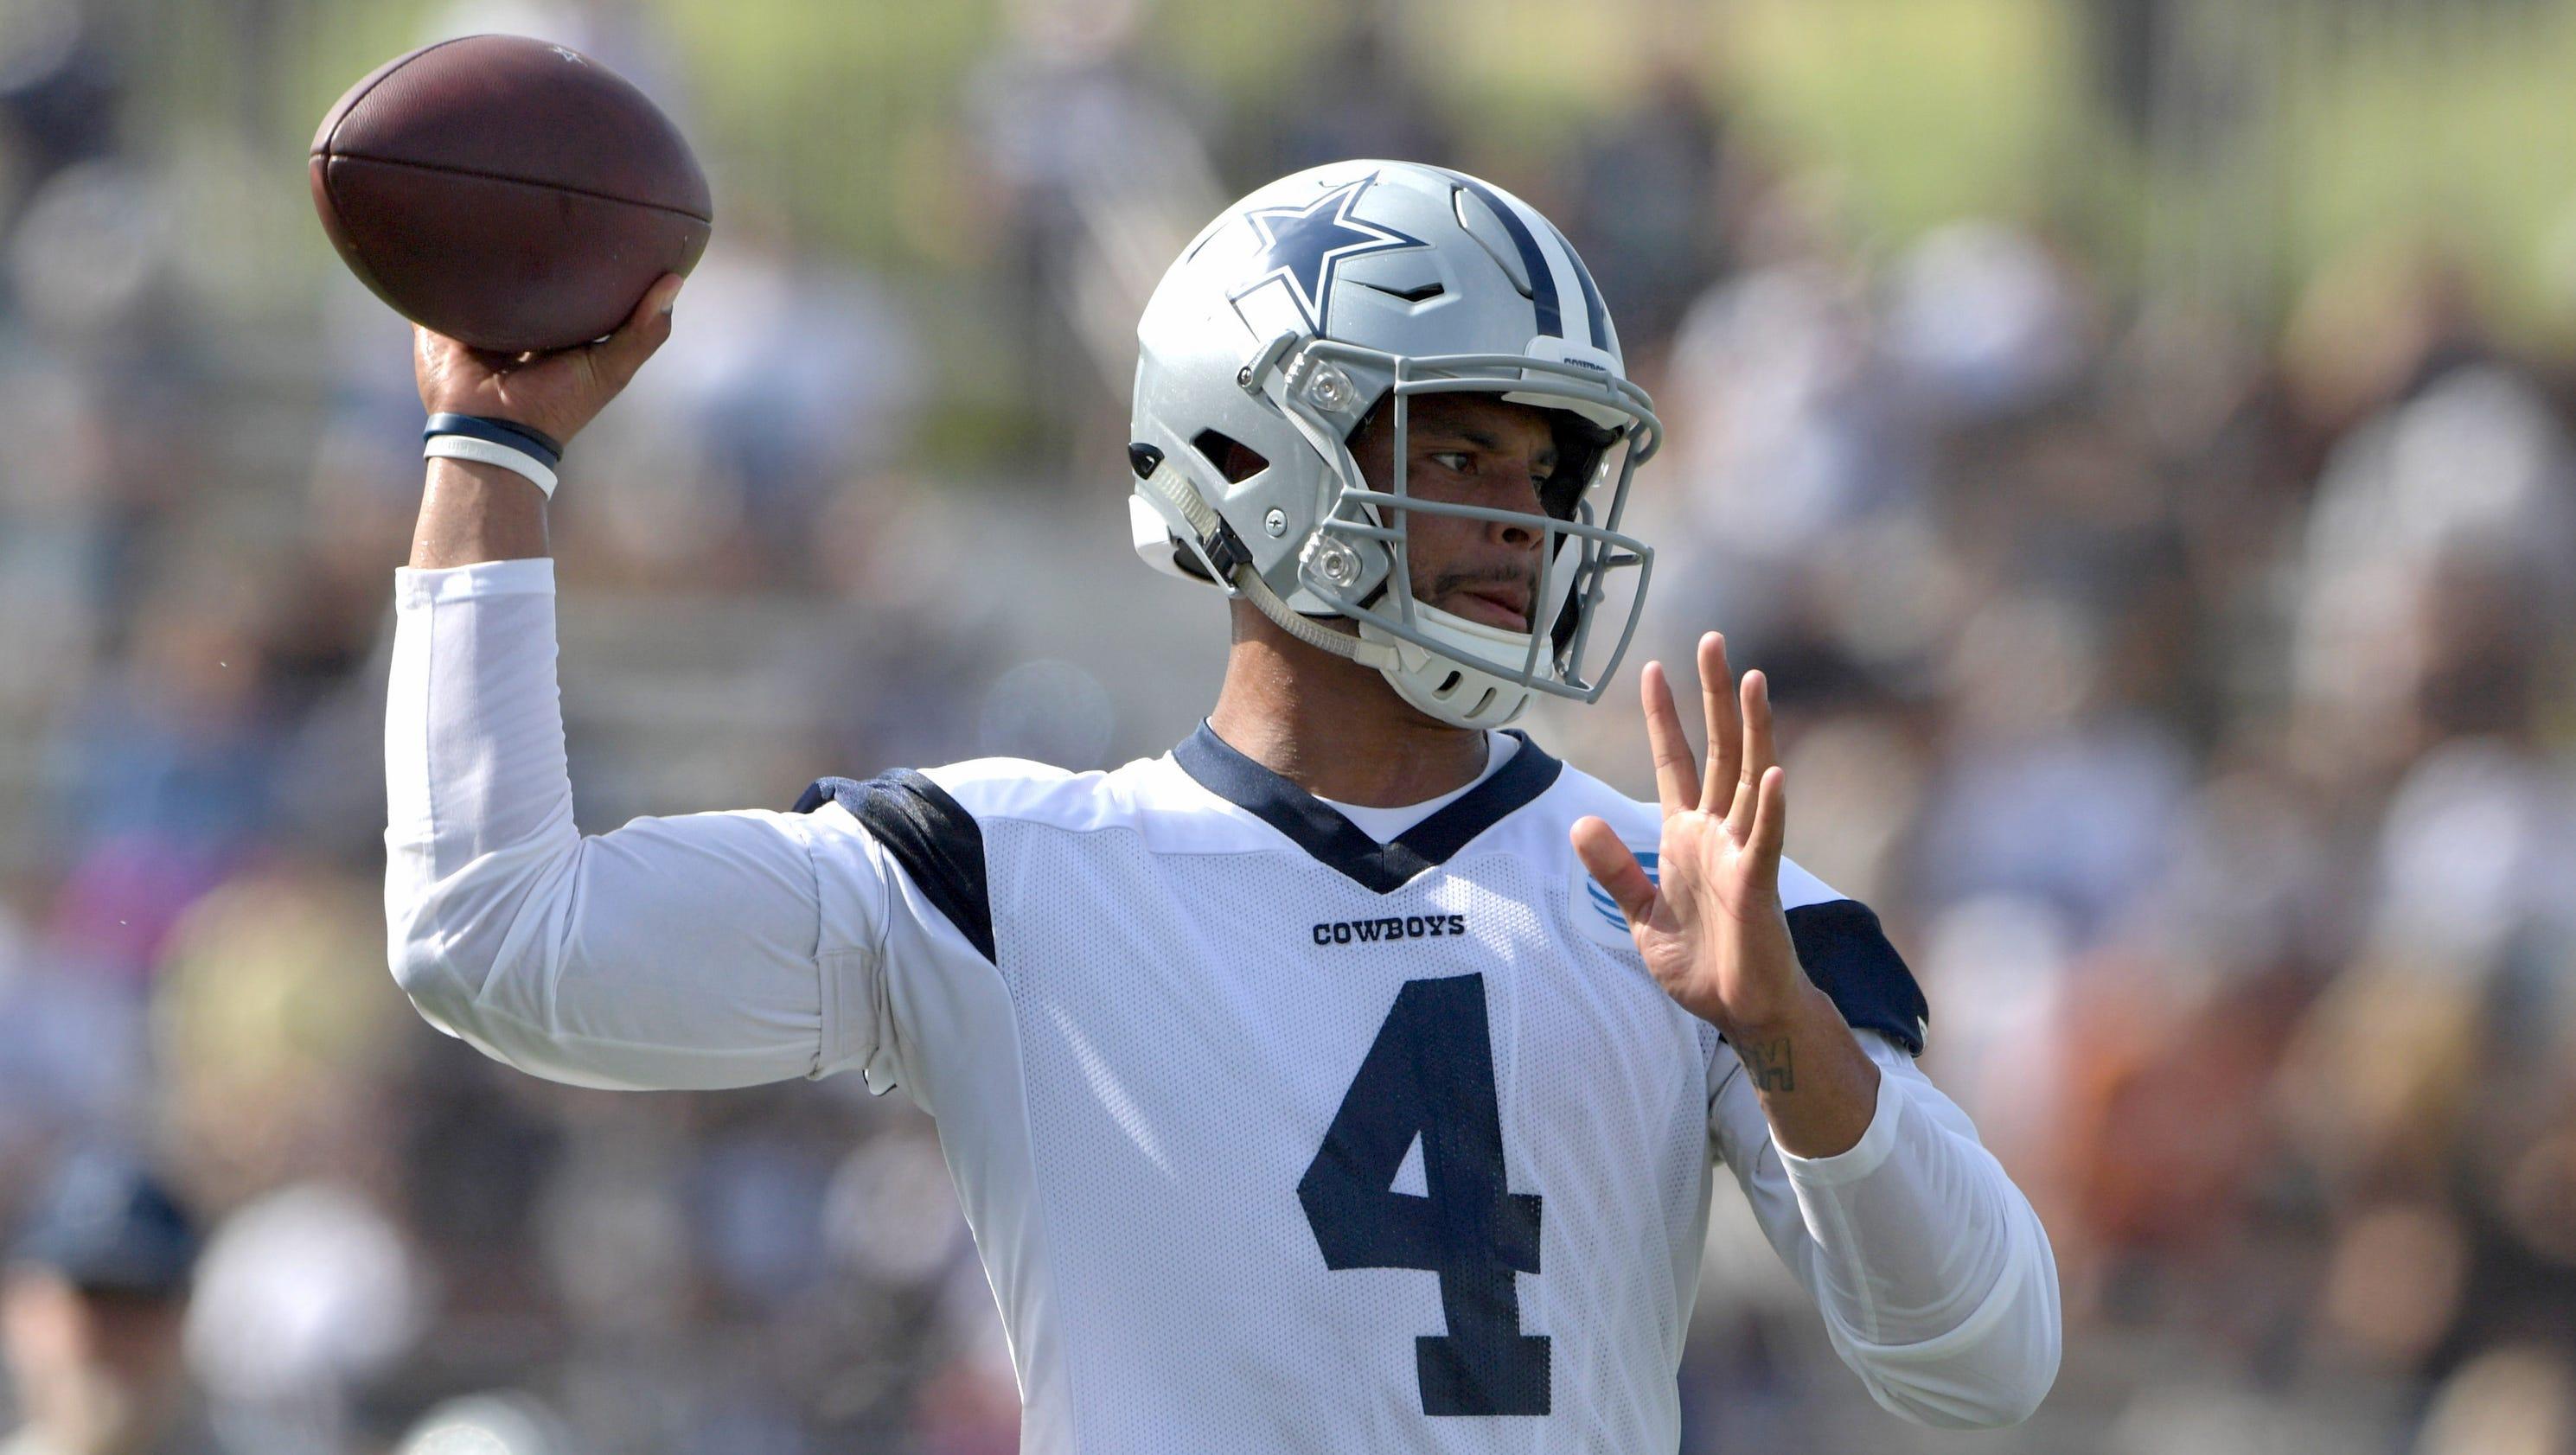 Cowboys Dak Prescott feels no pressure, ready to take chances